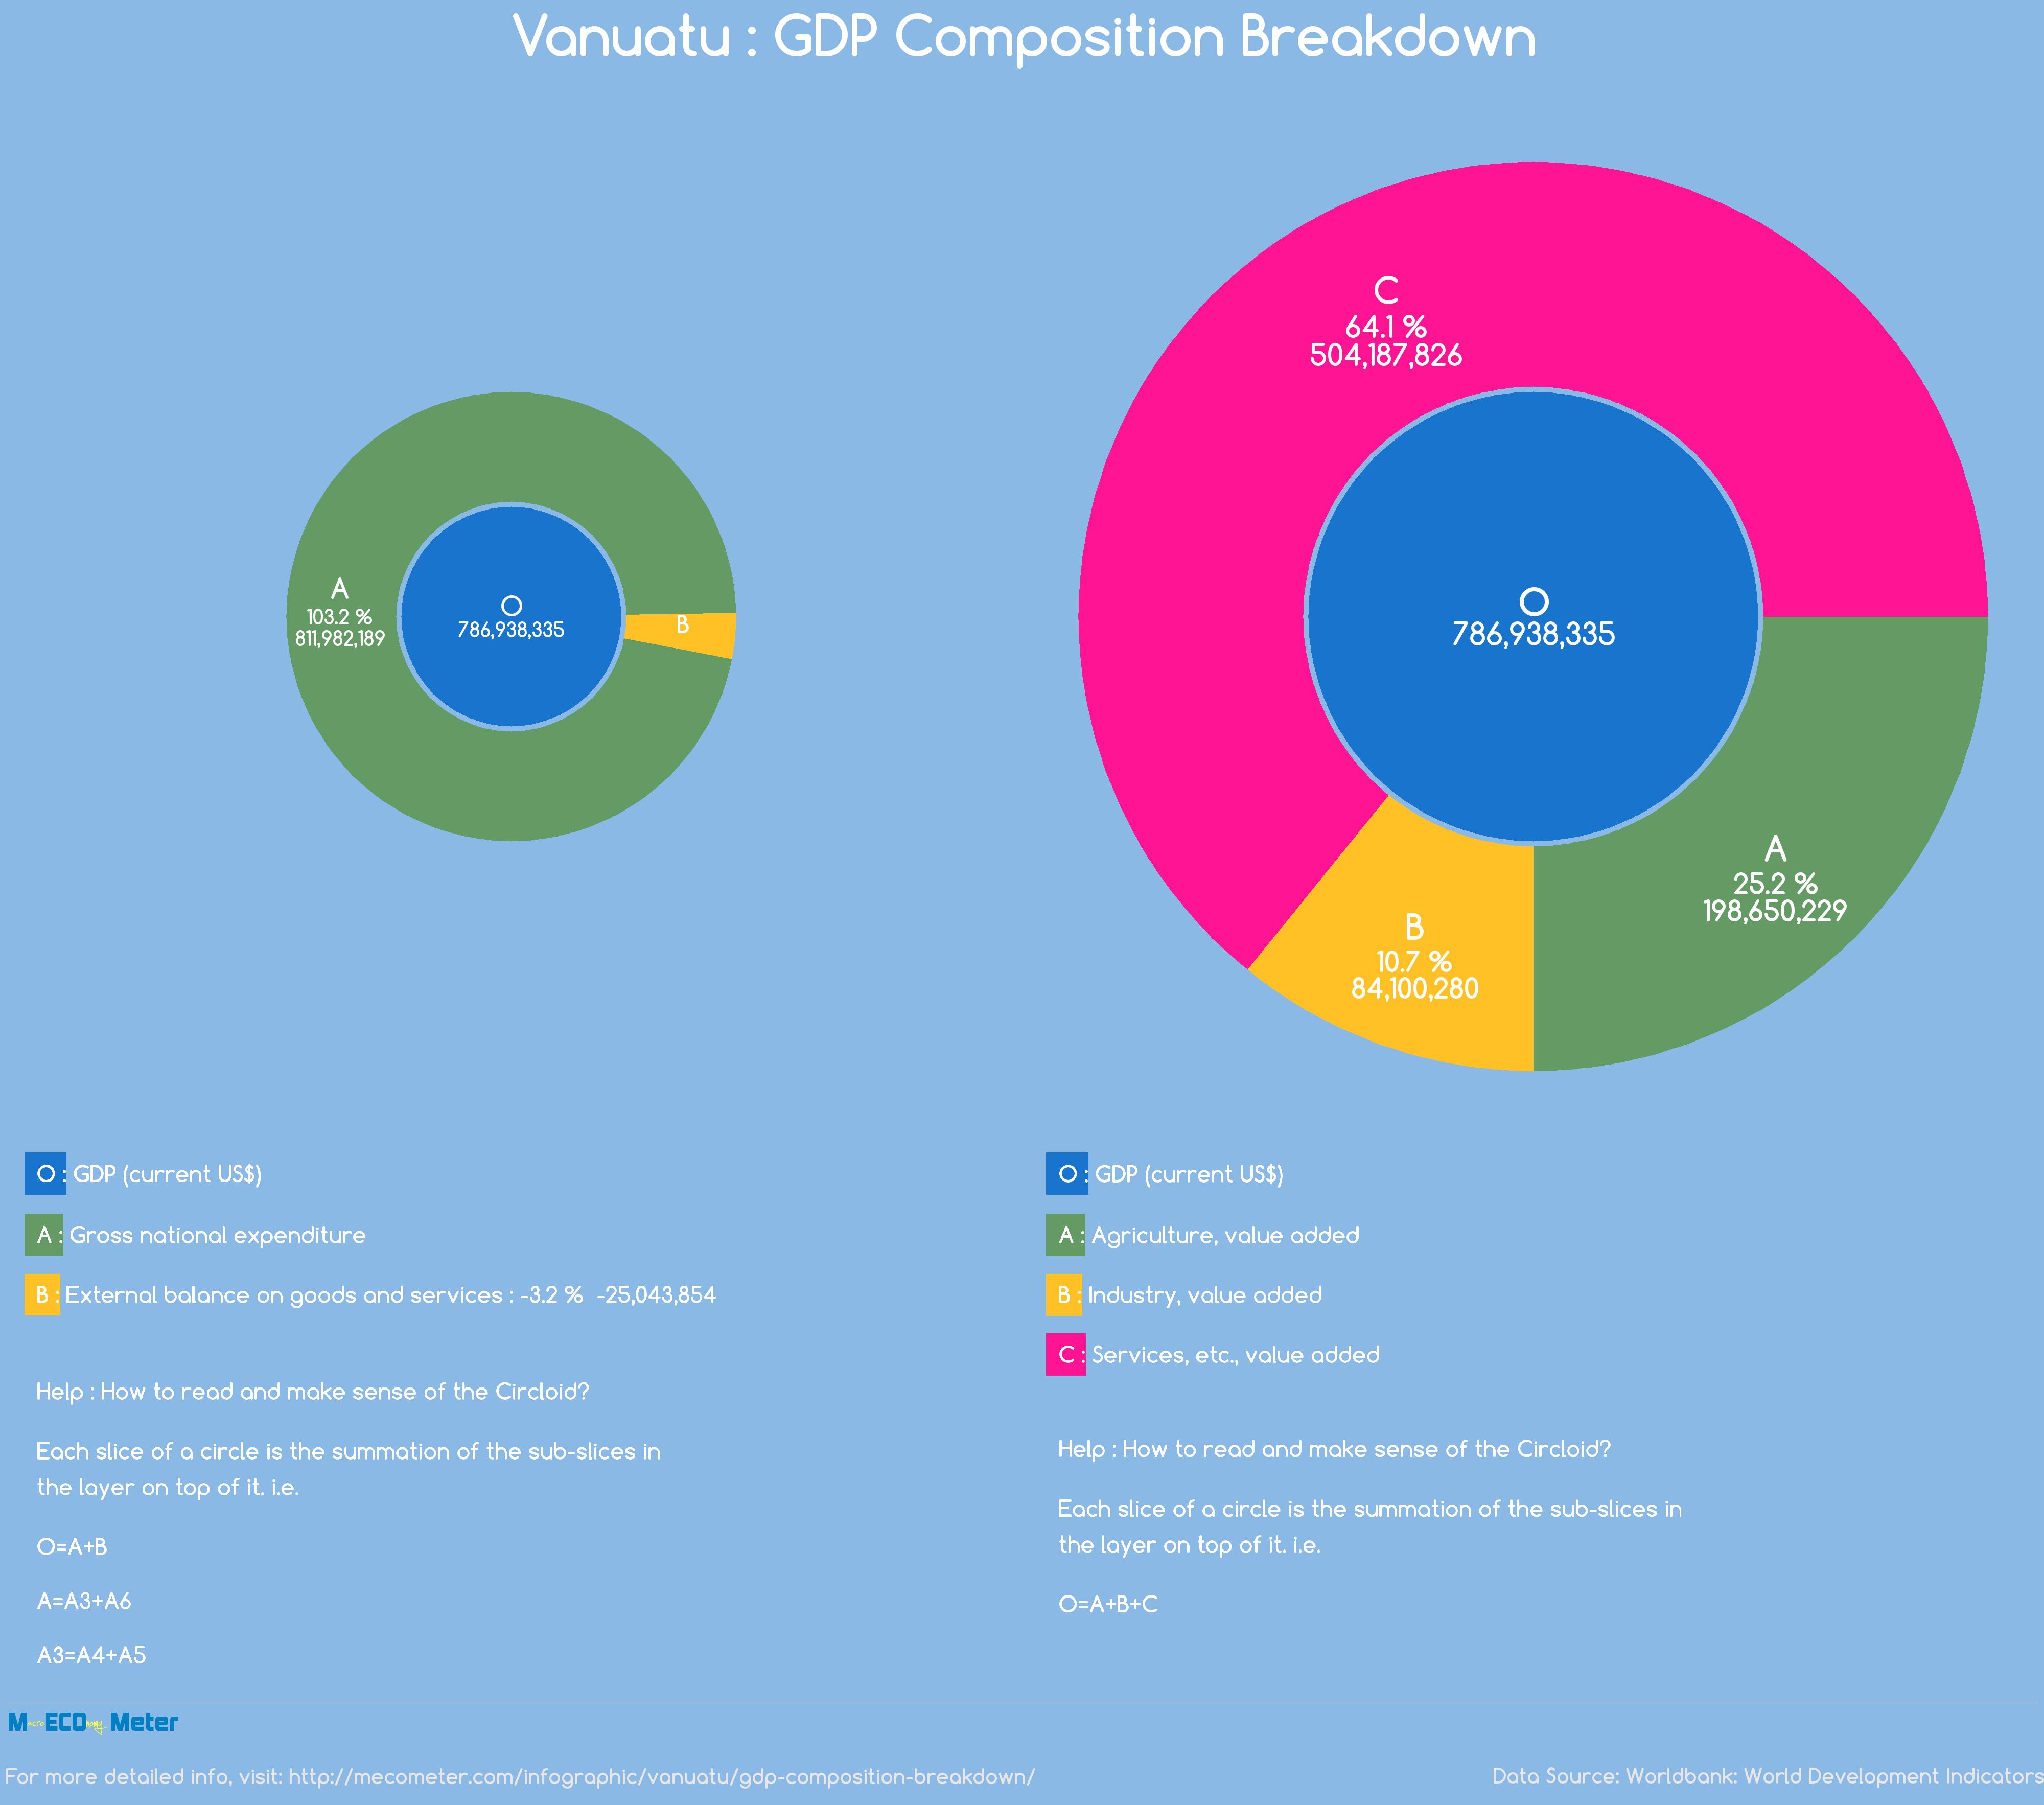 Vanuatu : GDP Composition Breakdown